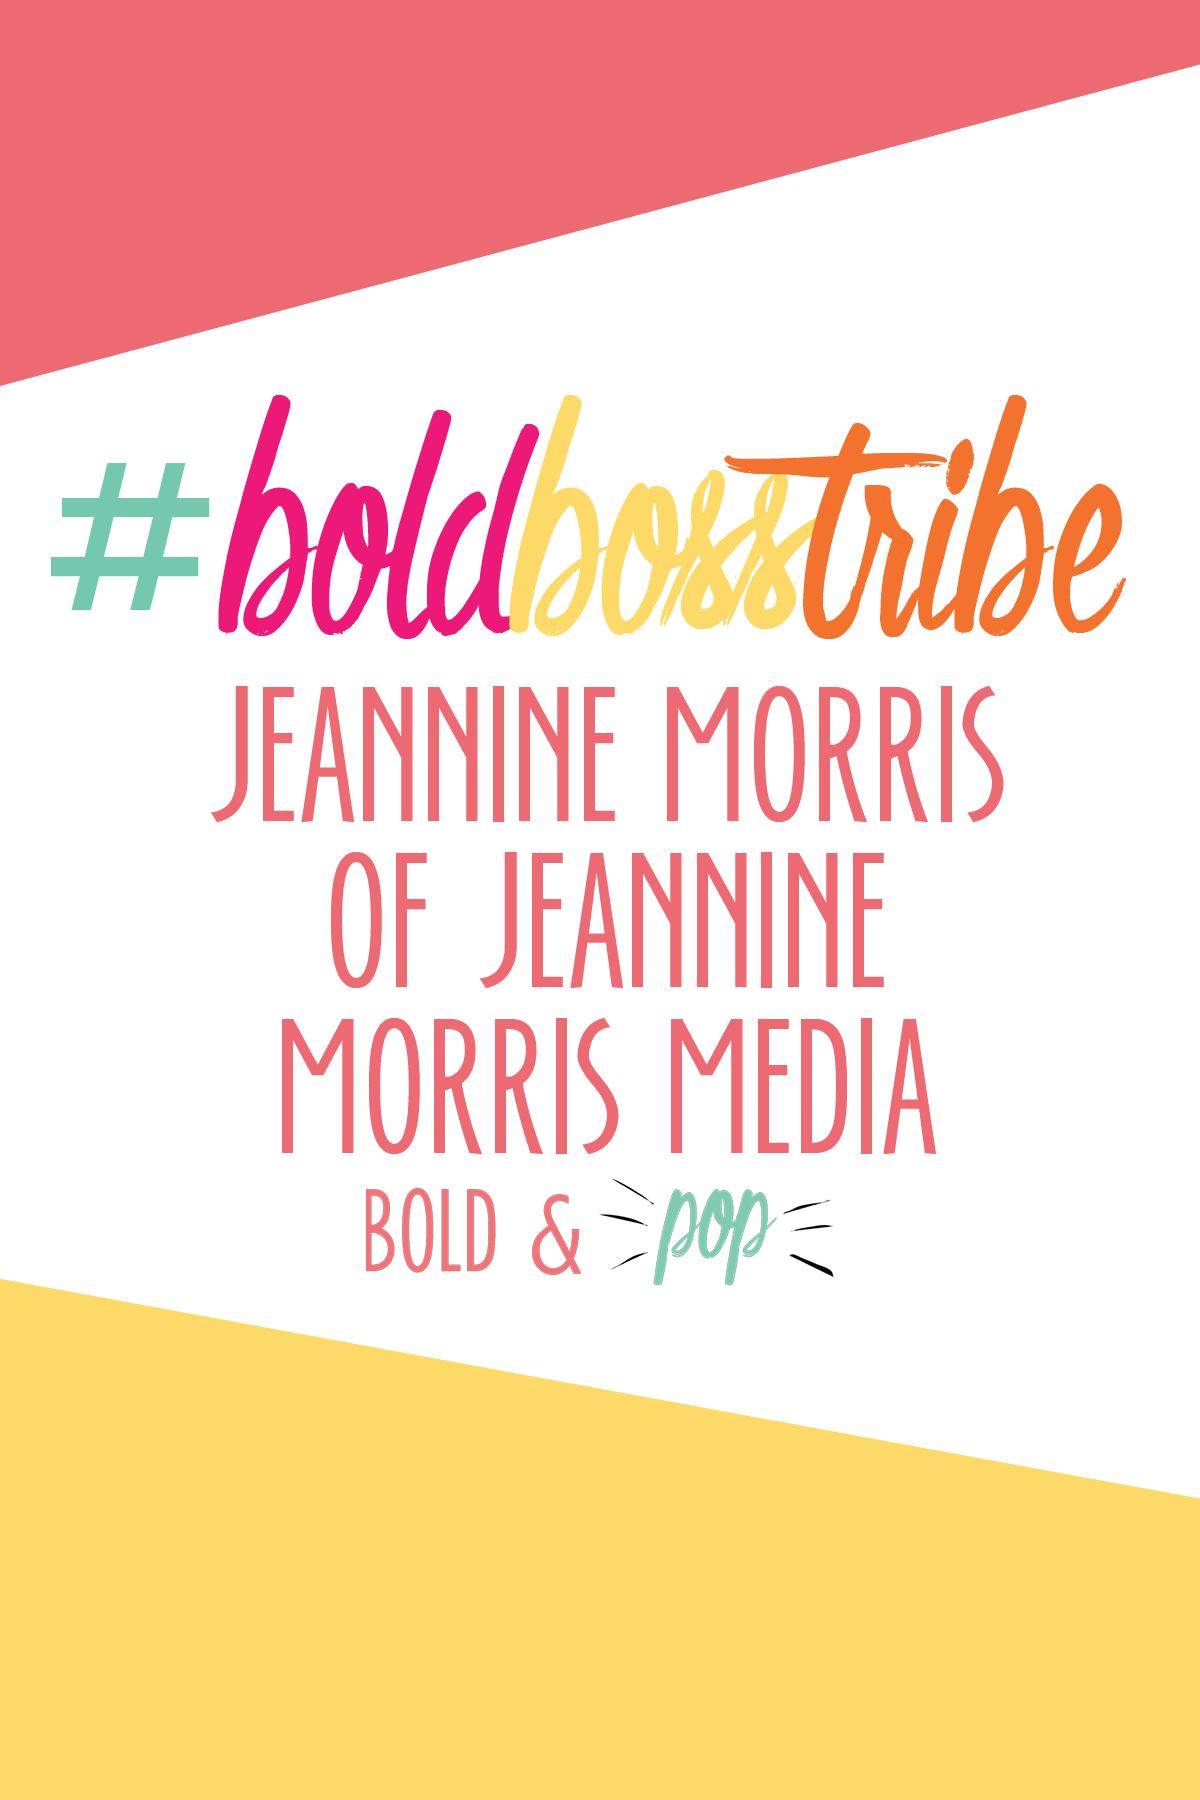 Bold & Pop :: #BoldBossTribe Feature with Jeannine Morris of Jeannine Morris Media